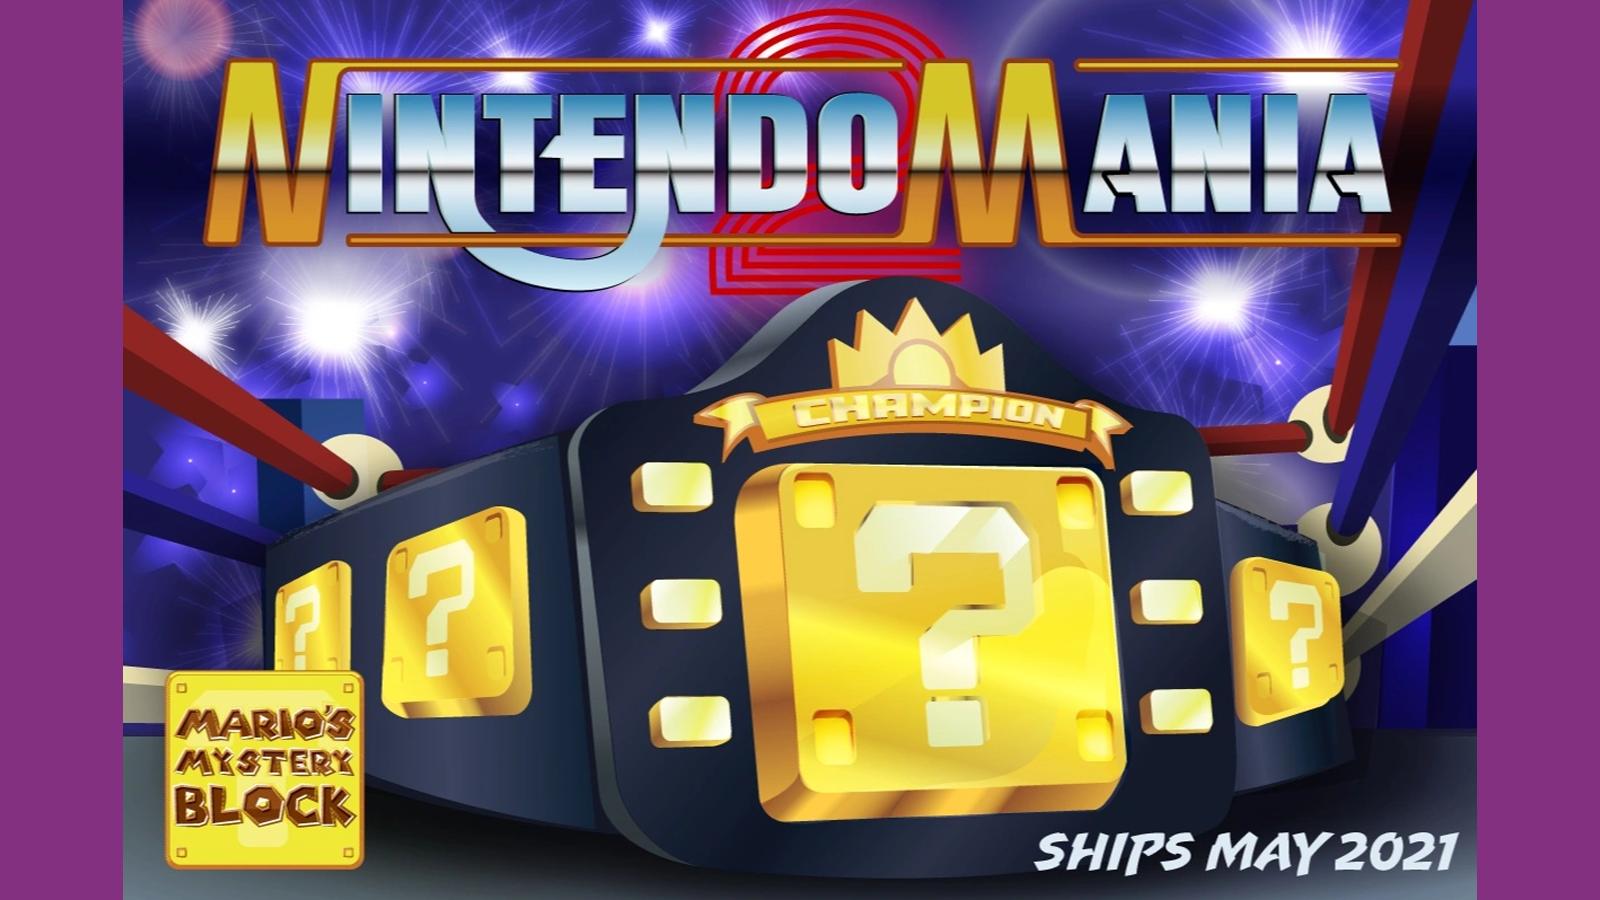 Mario's Mystery Block subscription box website